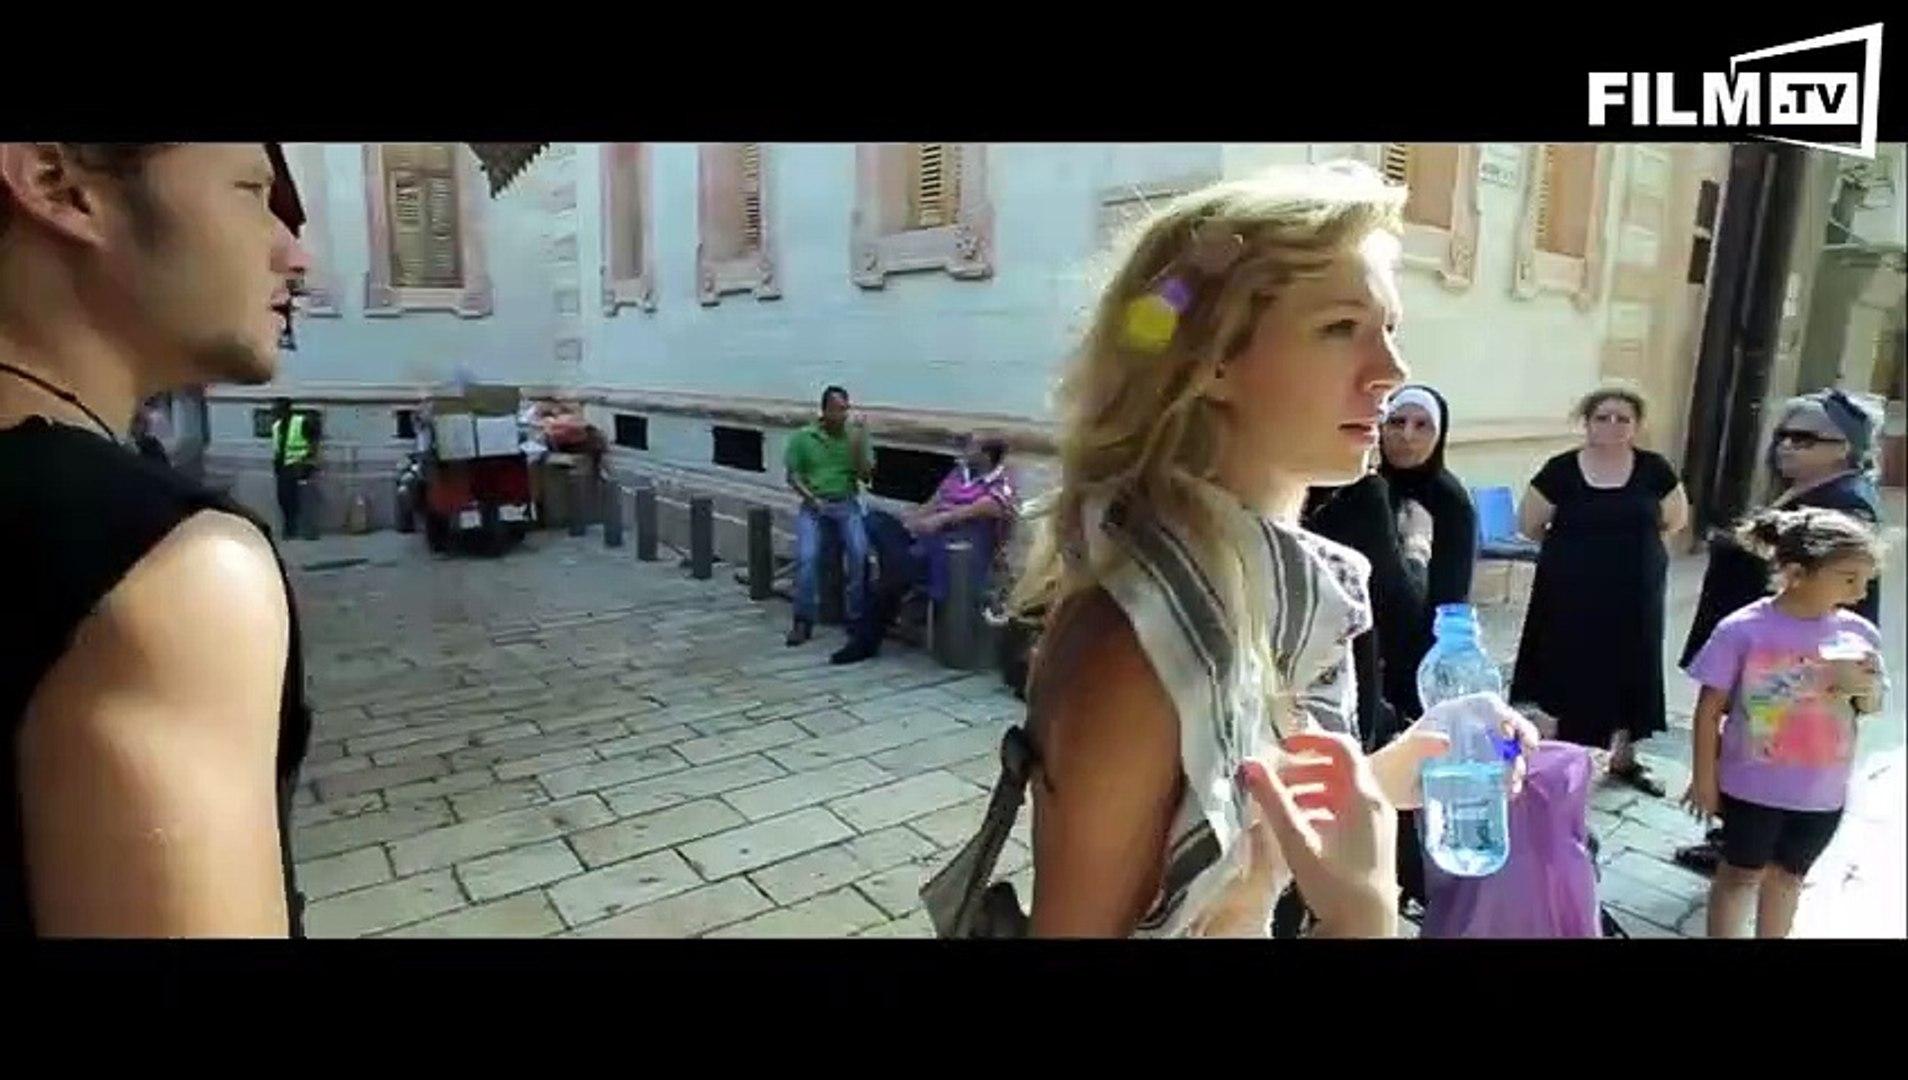 JeruZalem - Trailer - Filmkritik (2016) - Trailer